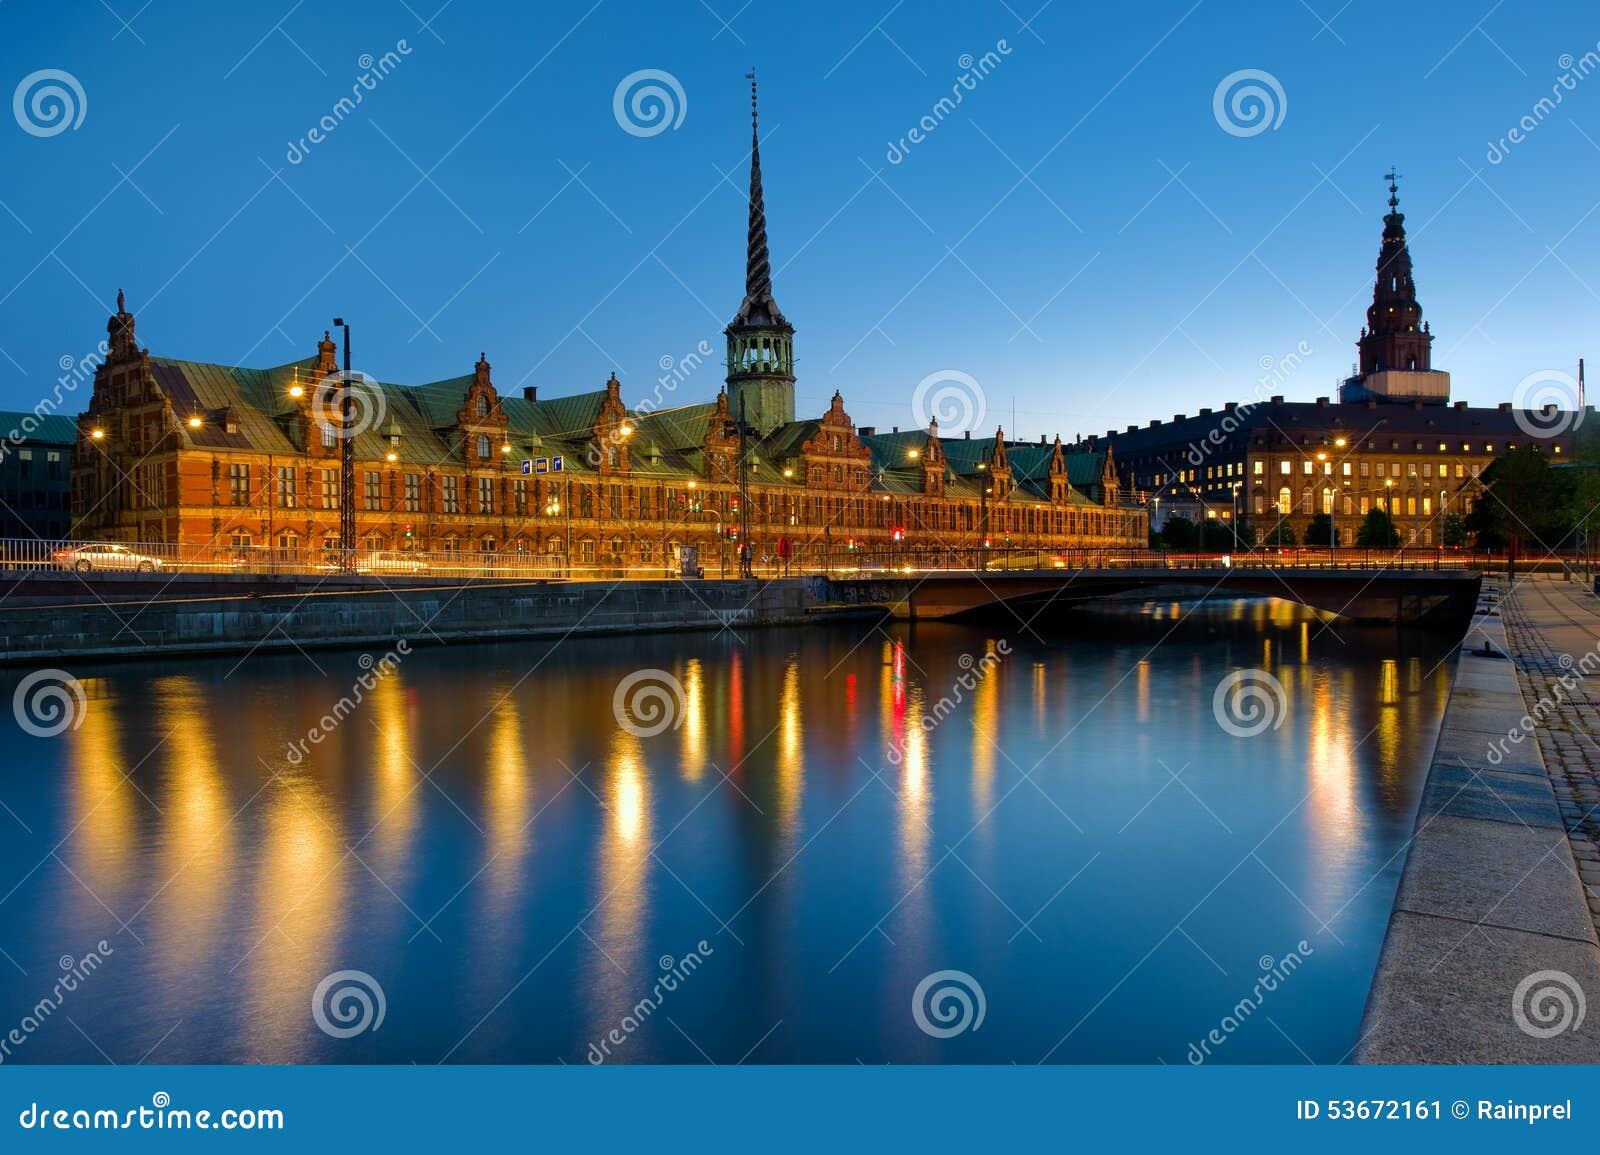 Borsen联交所大厦在哥本哈根,丹麦